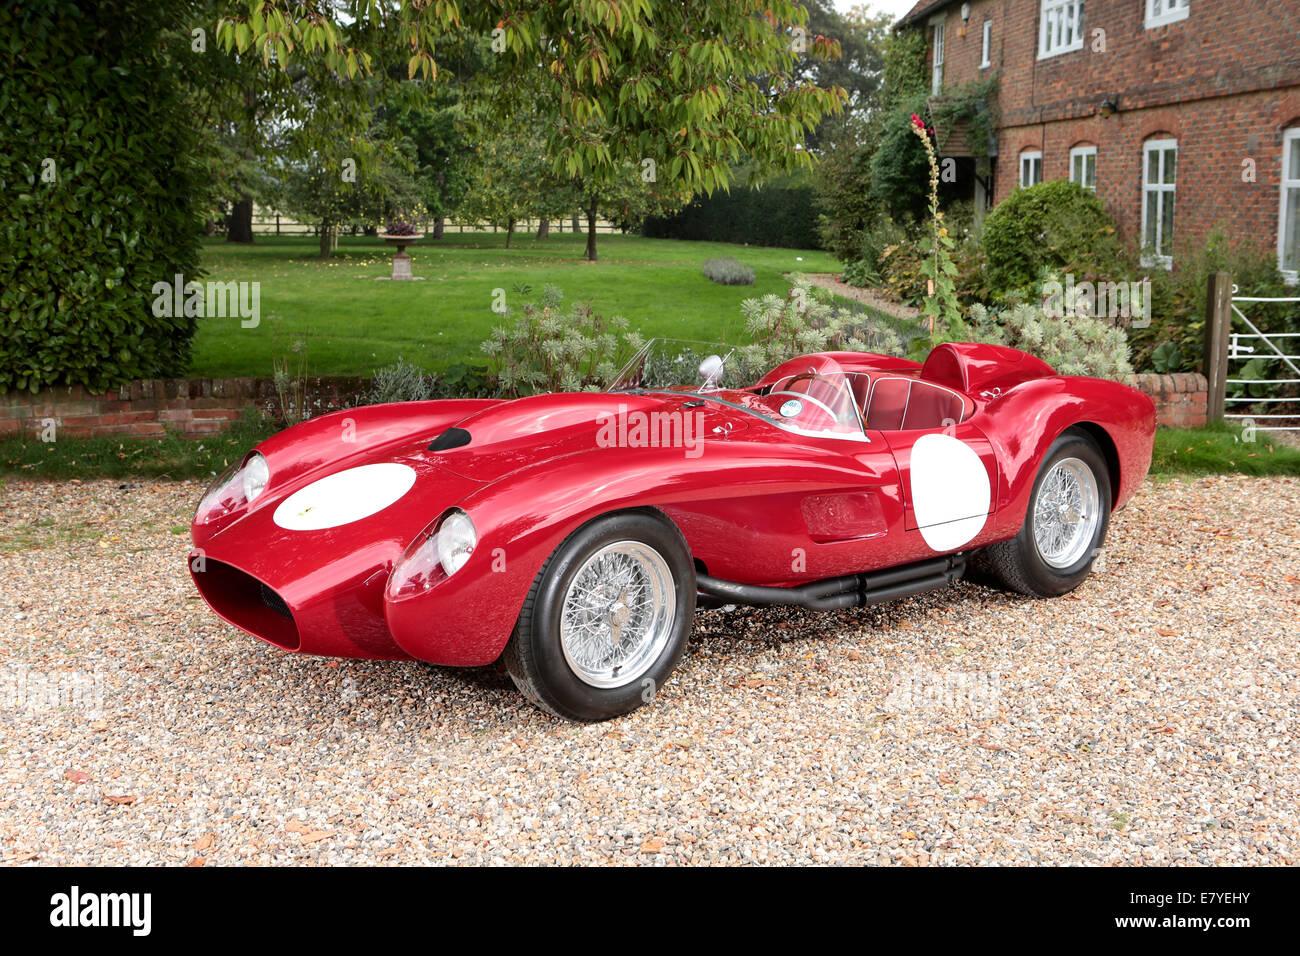 1958 Ferrari pontoon fender testarossa Stock Photo: 73748247  Alamy